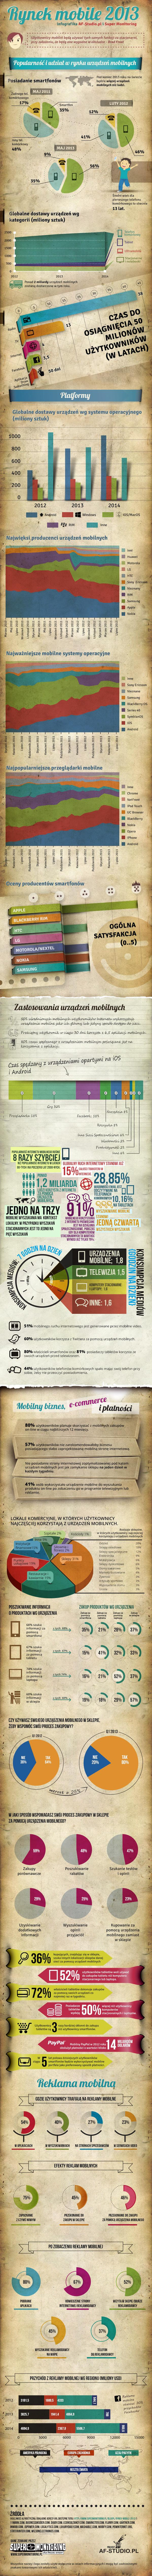 Rynek mobile 2013 - infografika